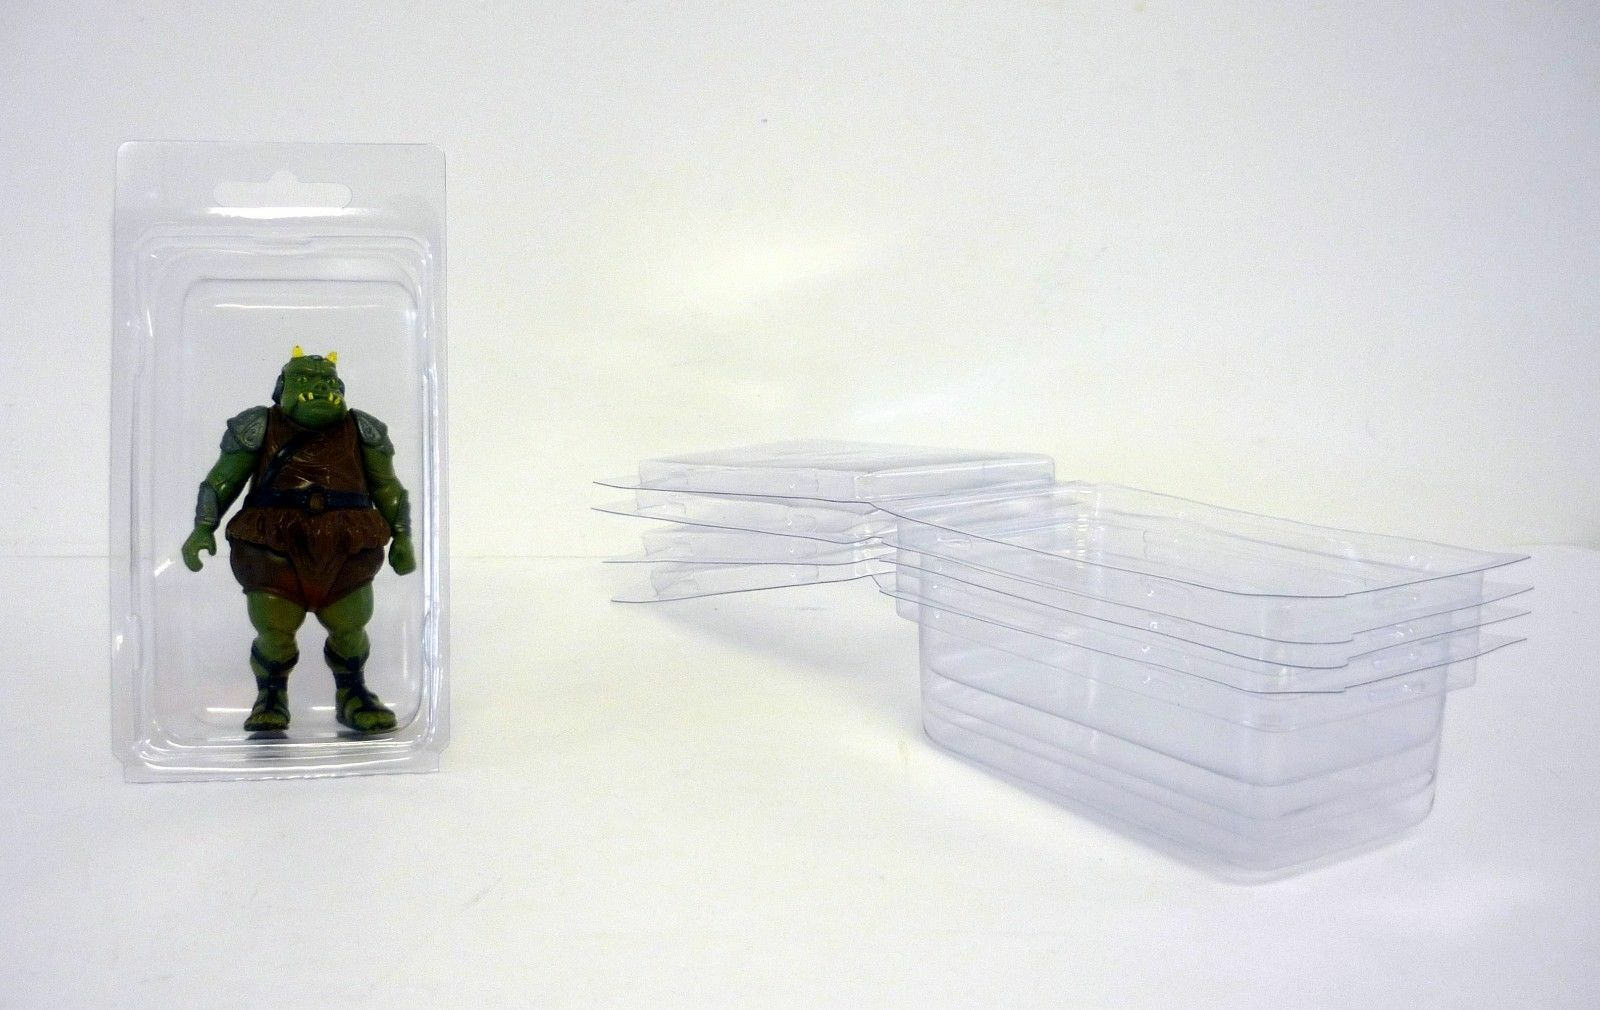 100 X Figura De Medio-flojo casos de Blister - 4.5 x2.375 x1.31  - Estrella Wars Gi Joe